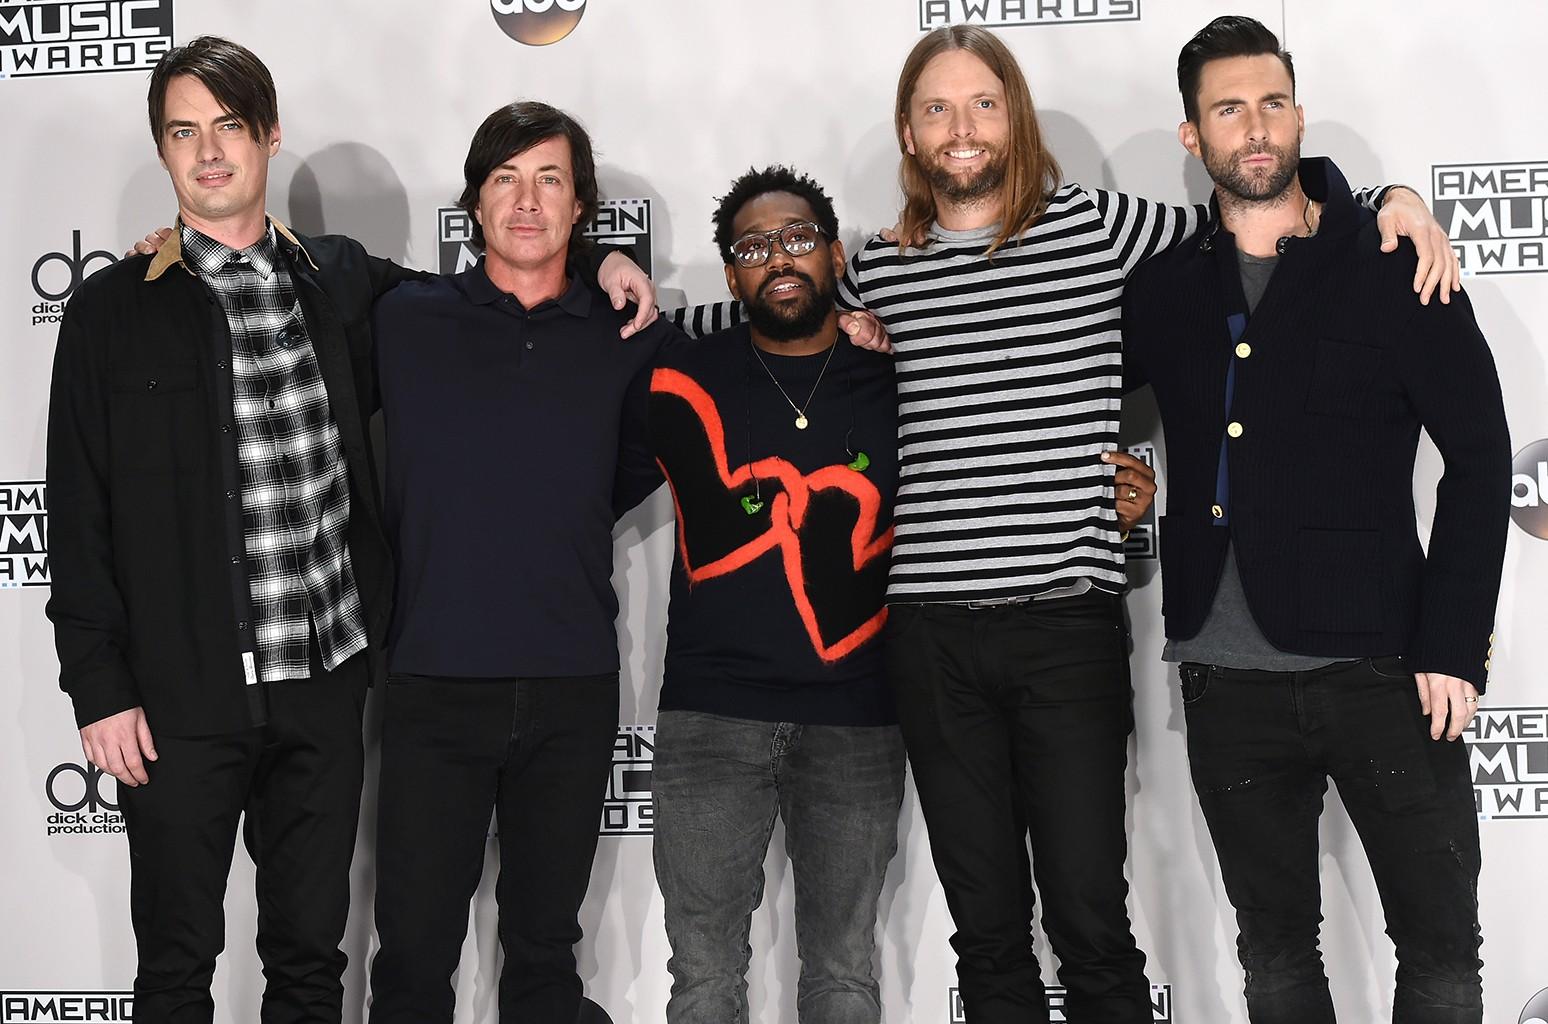 Maroon 5 at the American Music Awards